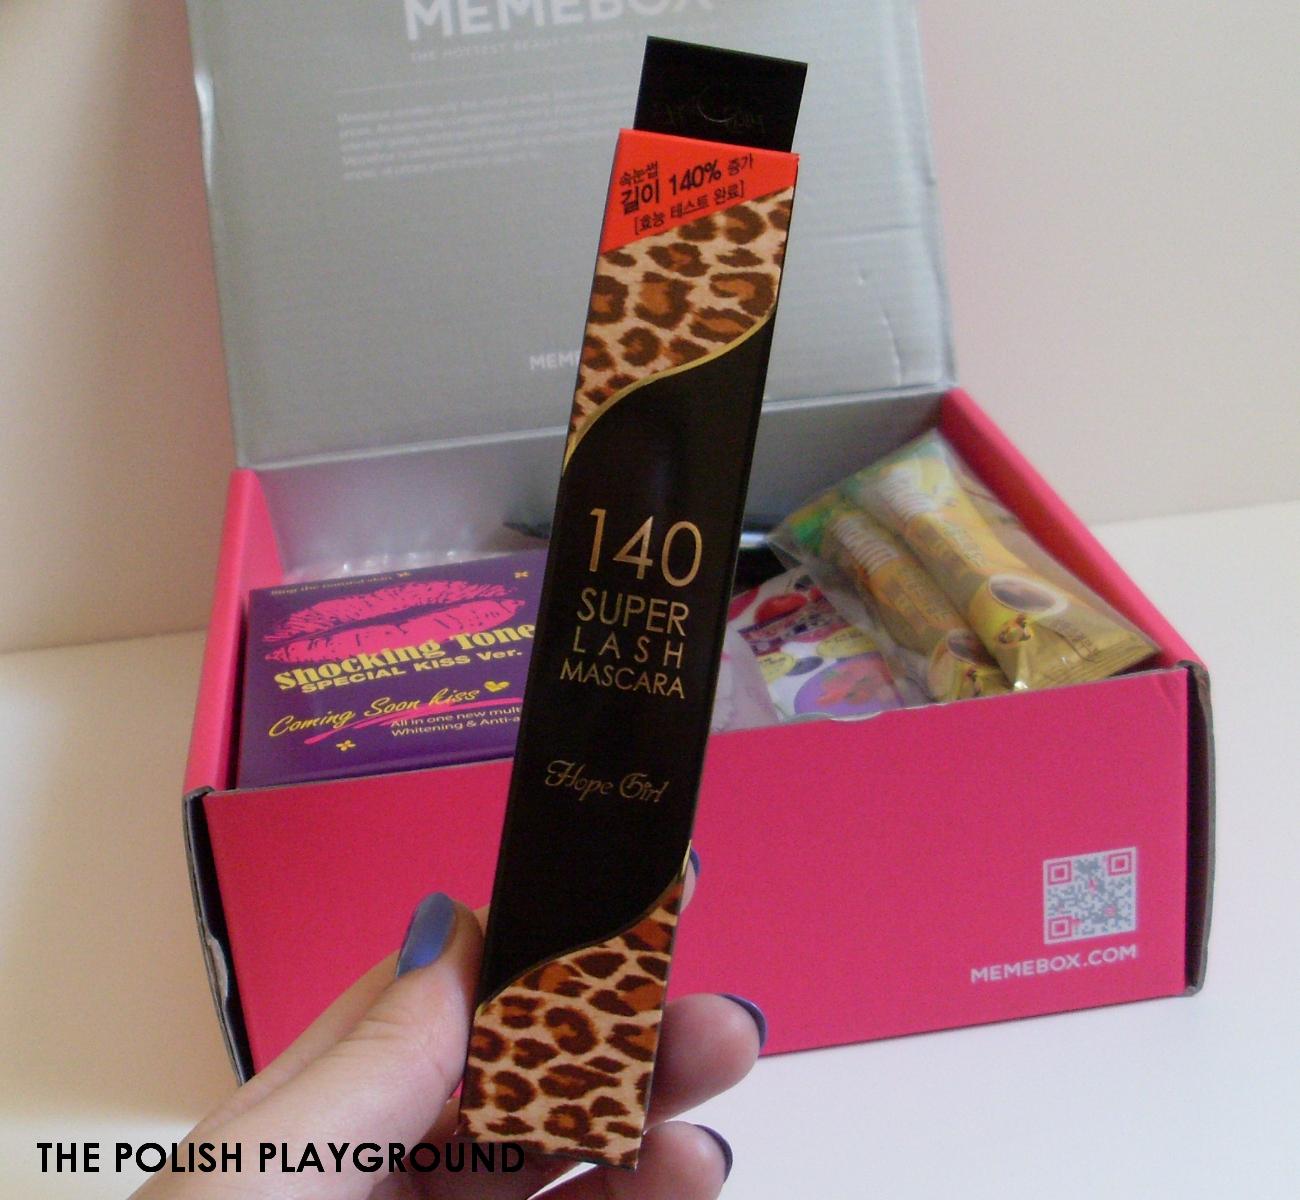 Memebox Office Essentials Unboxing - Hope Girl 140 Super Lash Mascara